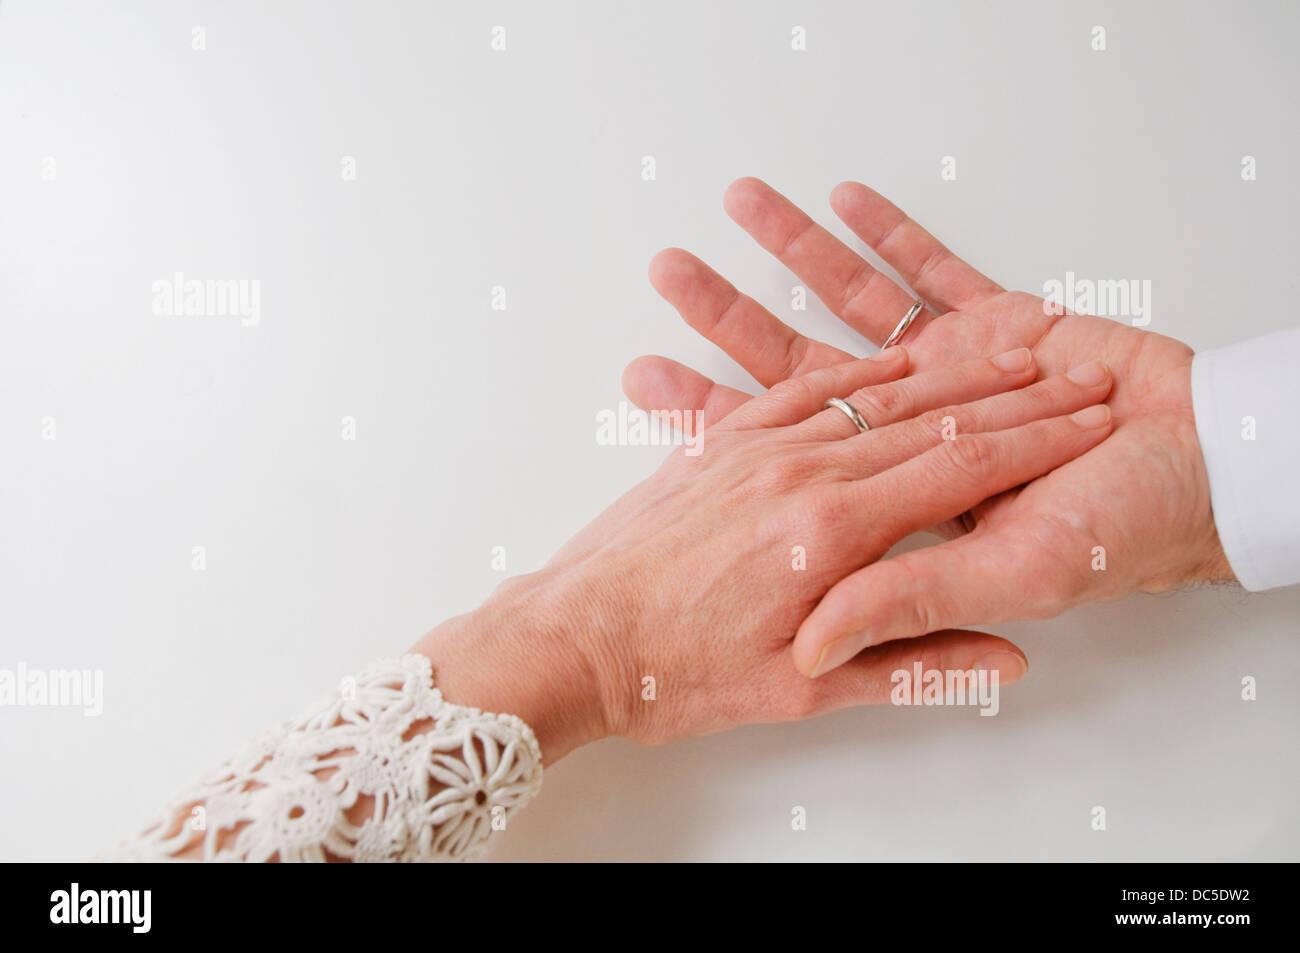 Pareja de manos usando anillos de boda. Imagen De Stock